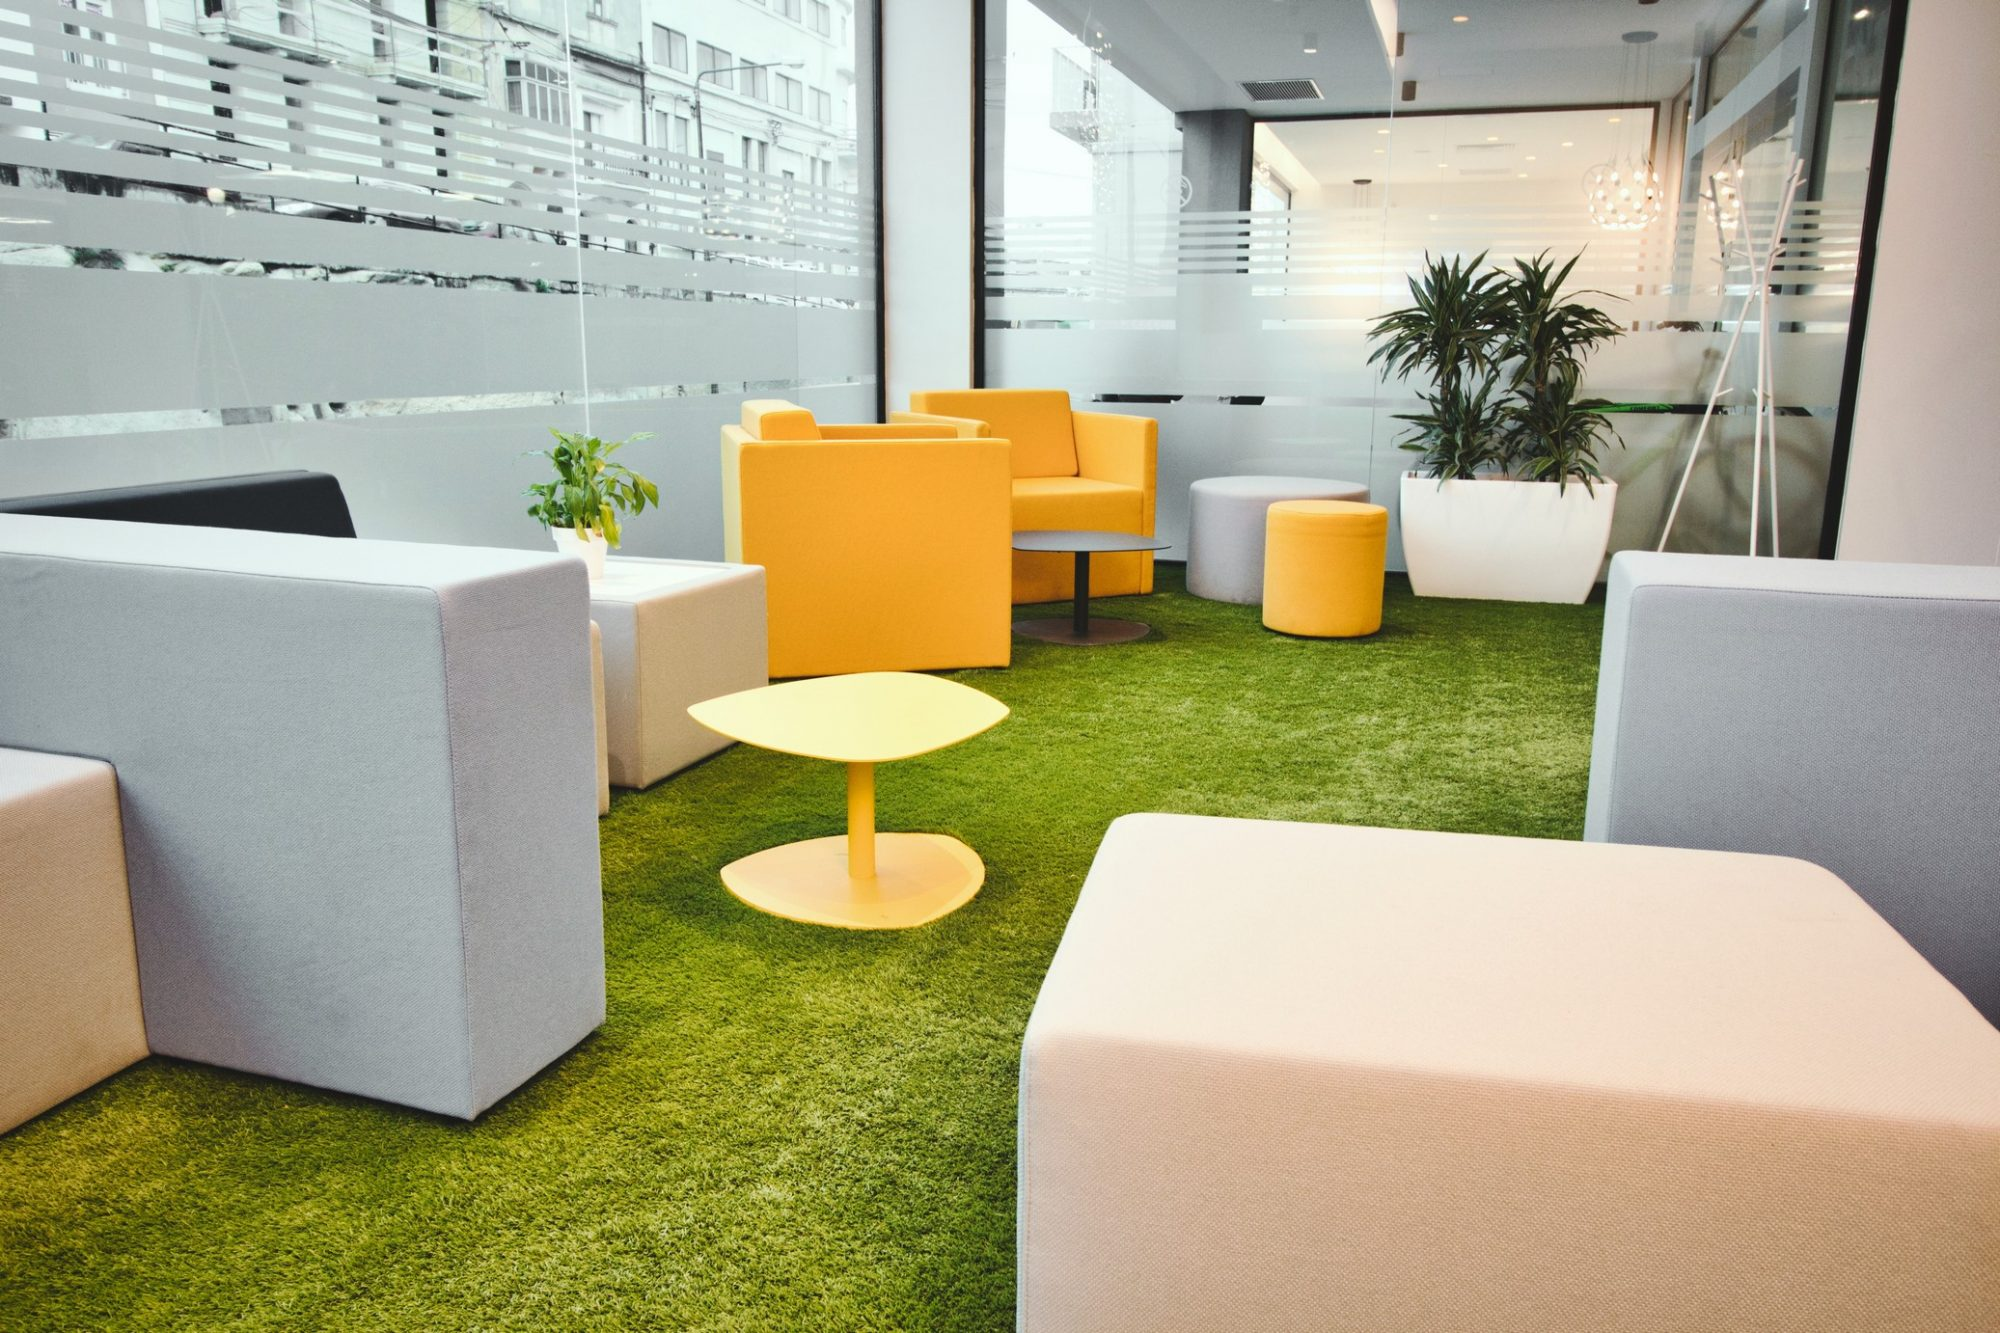 Break Room Design in Dallas Fort Worth